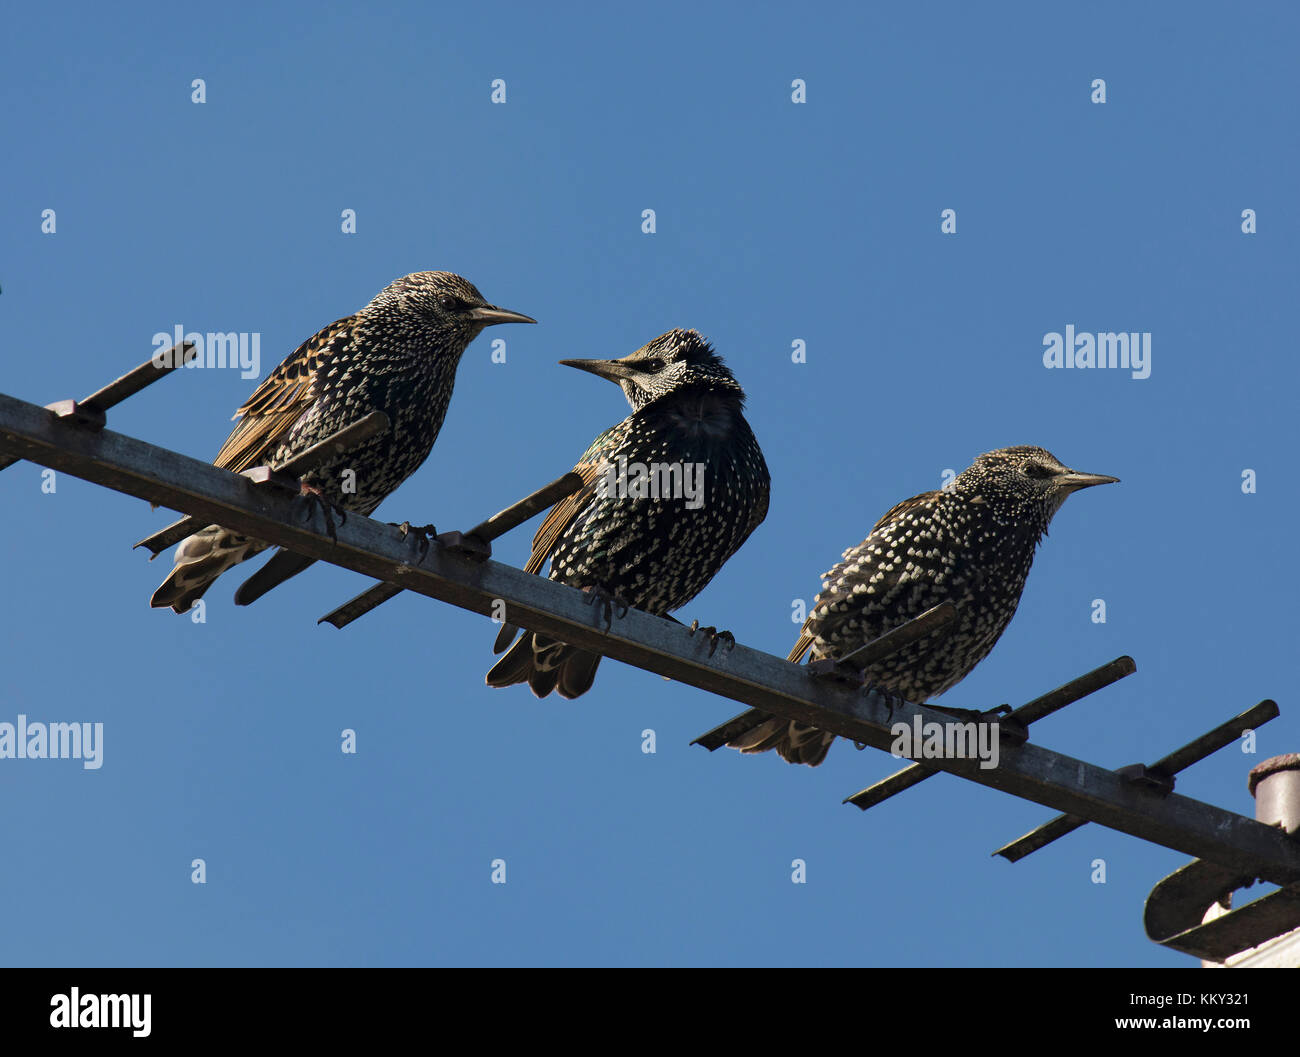 Three Common Starling, sturnus vulgaris, perched on television aerial, Lancashire, UK - Stock Image